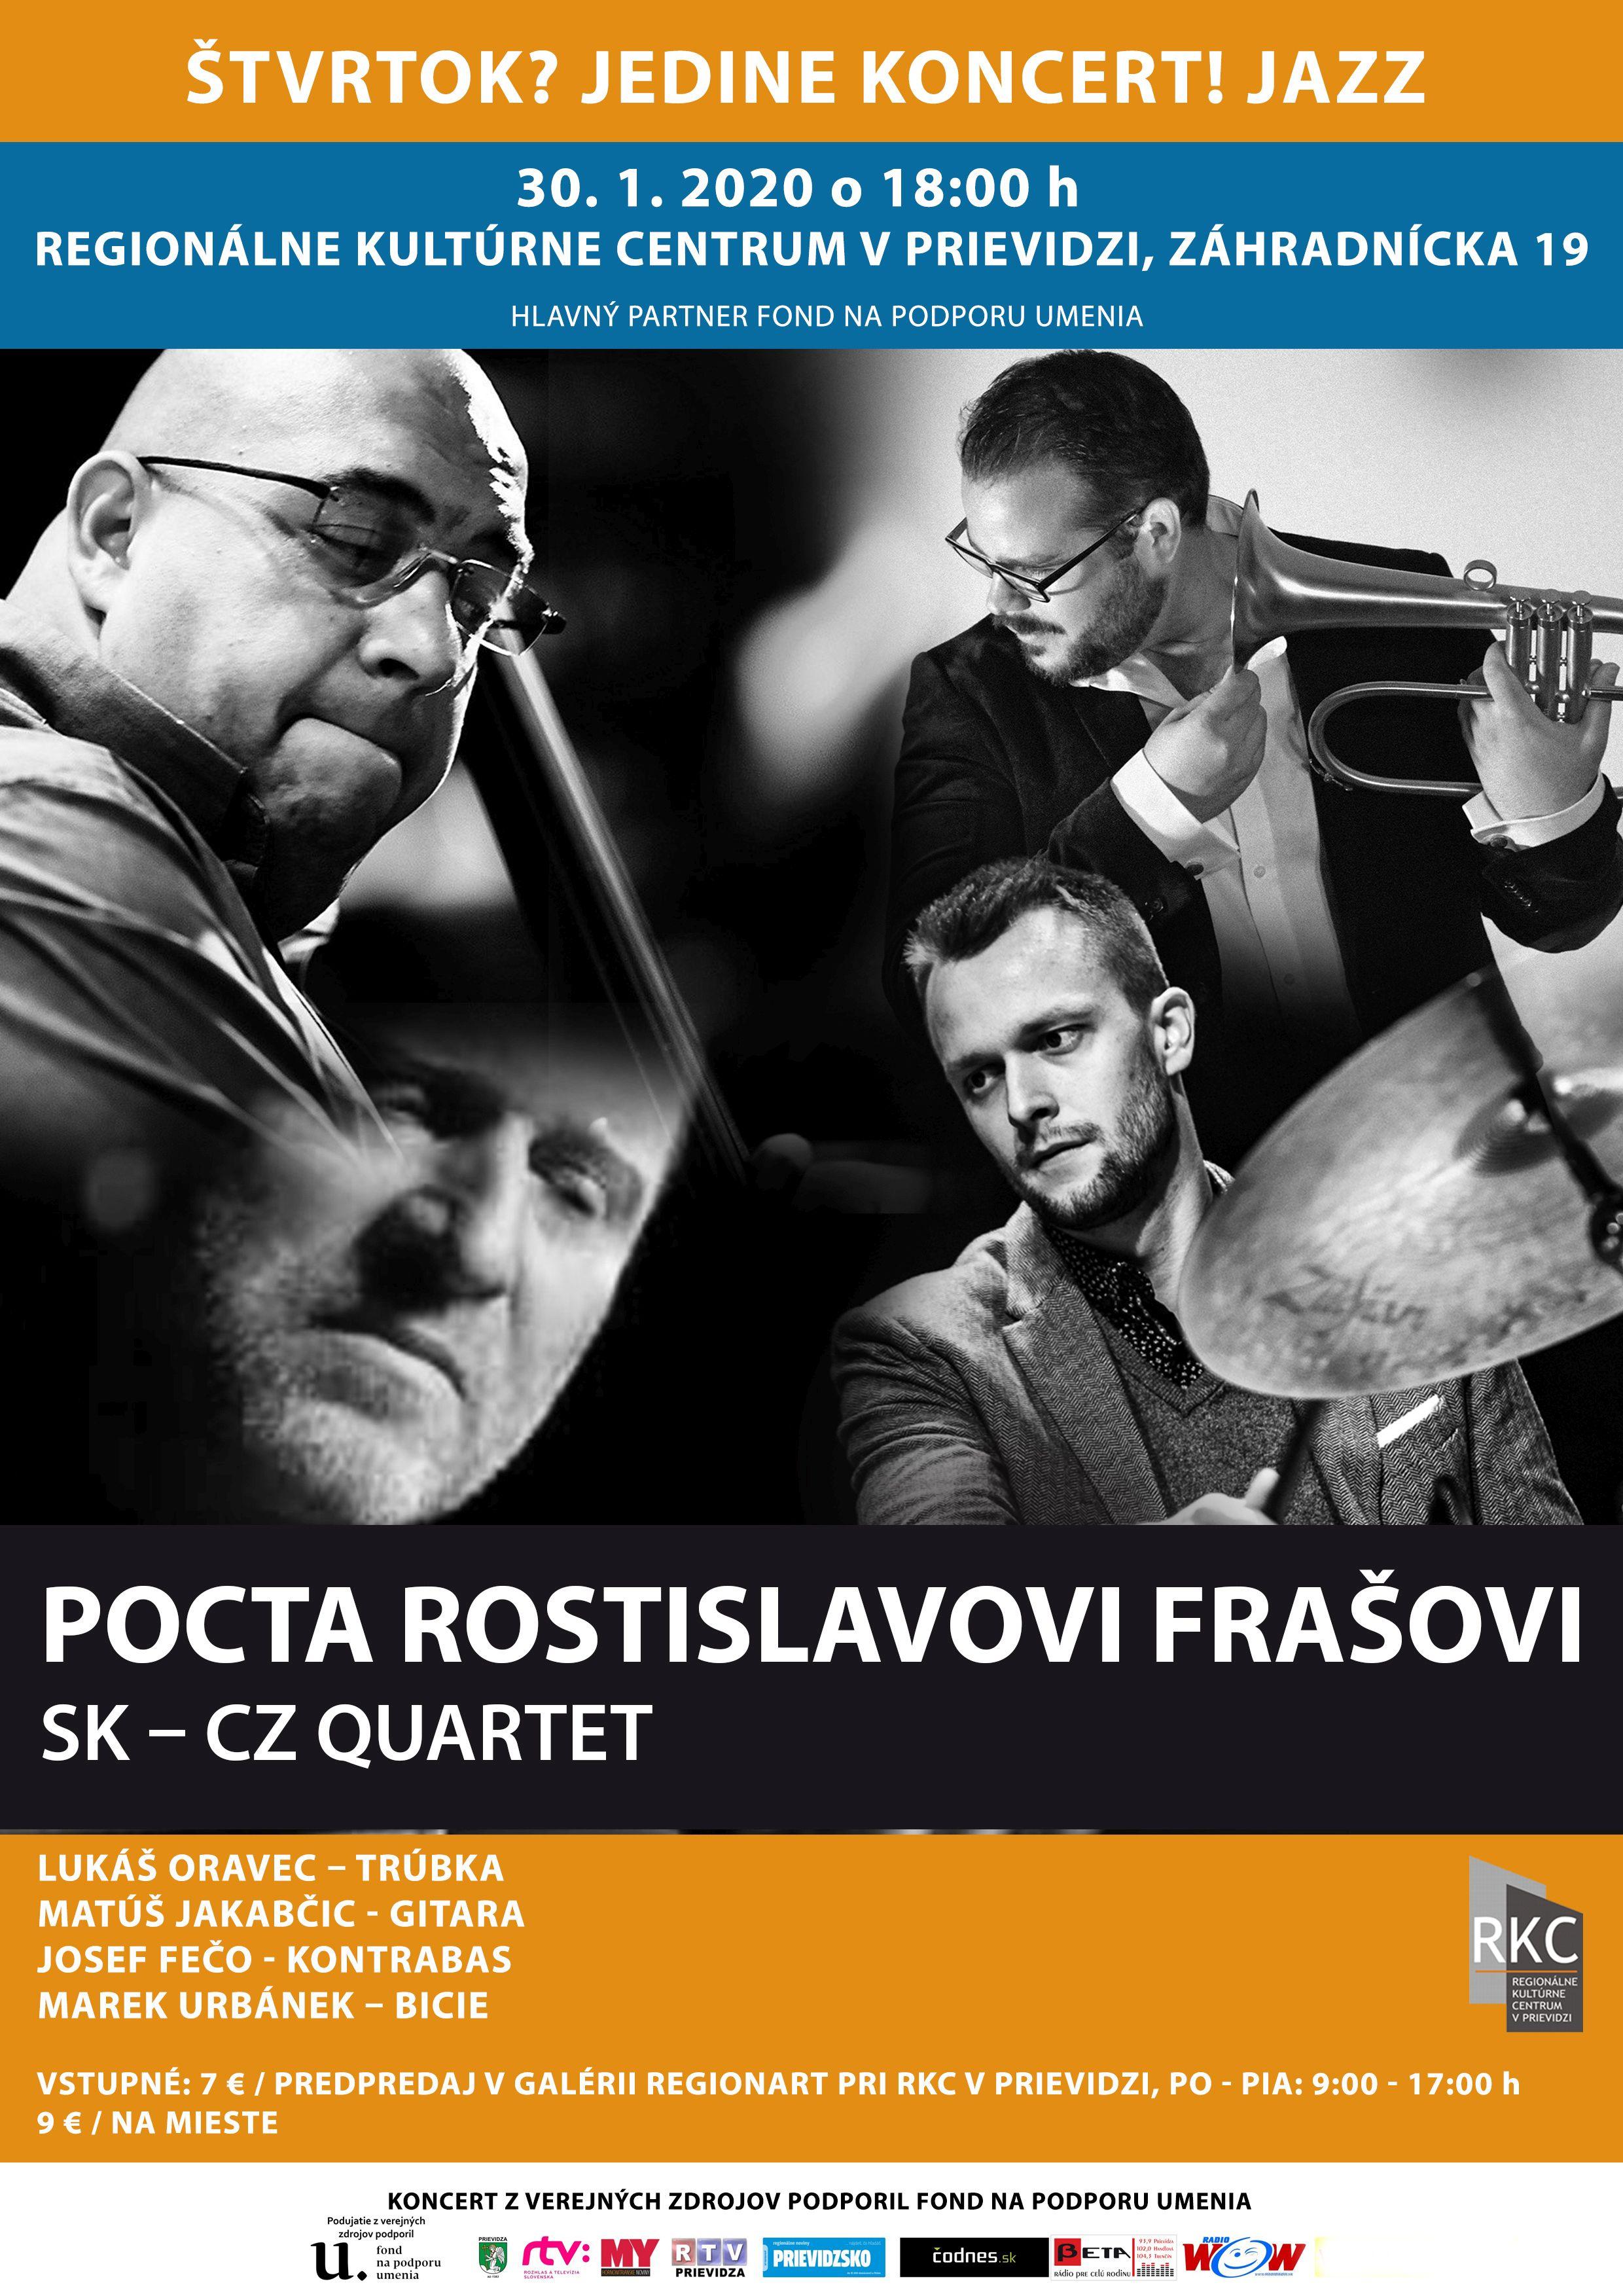 Štvrtok? Jedine koncert! JAZZ / Pocta Rostislavovi Frašovi - SK - CZ Quartet